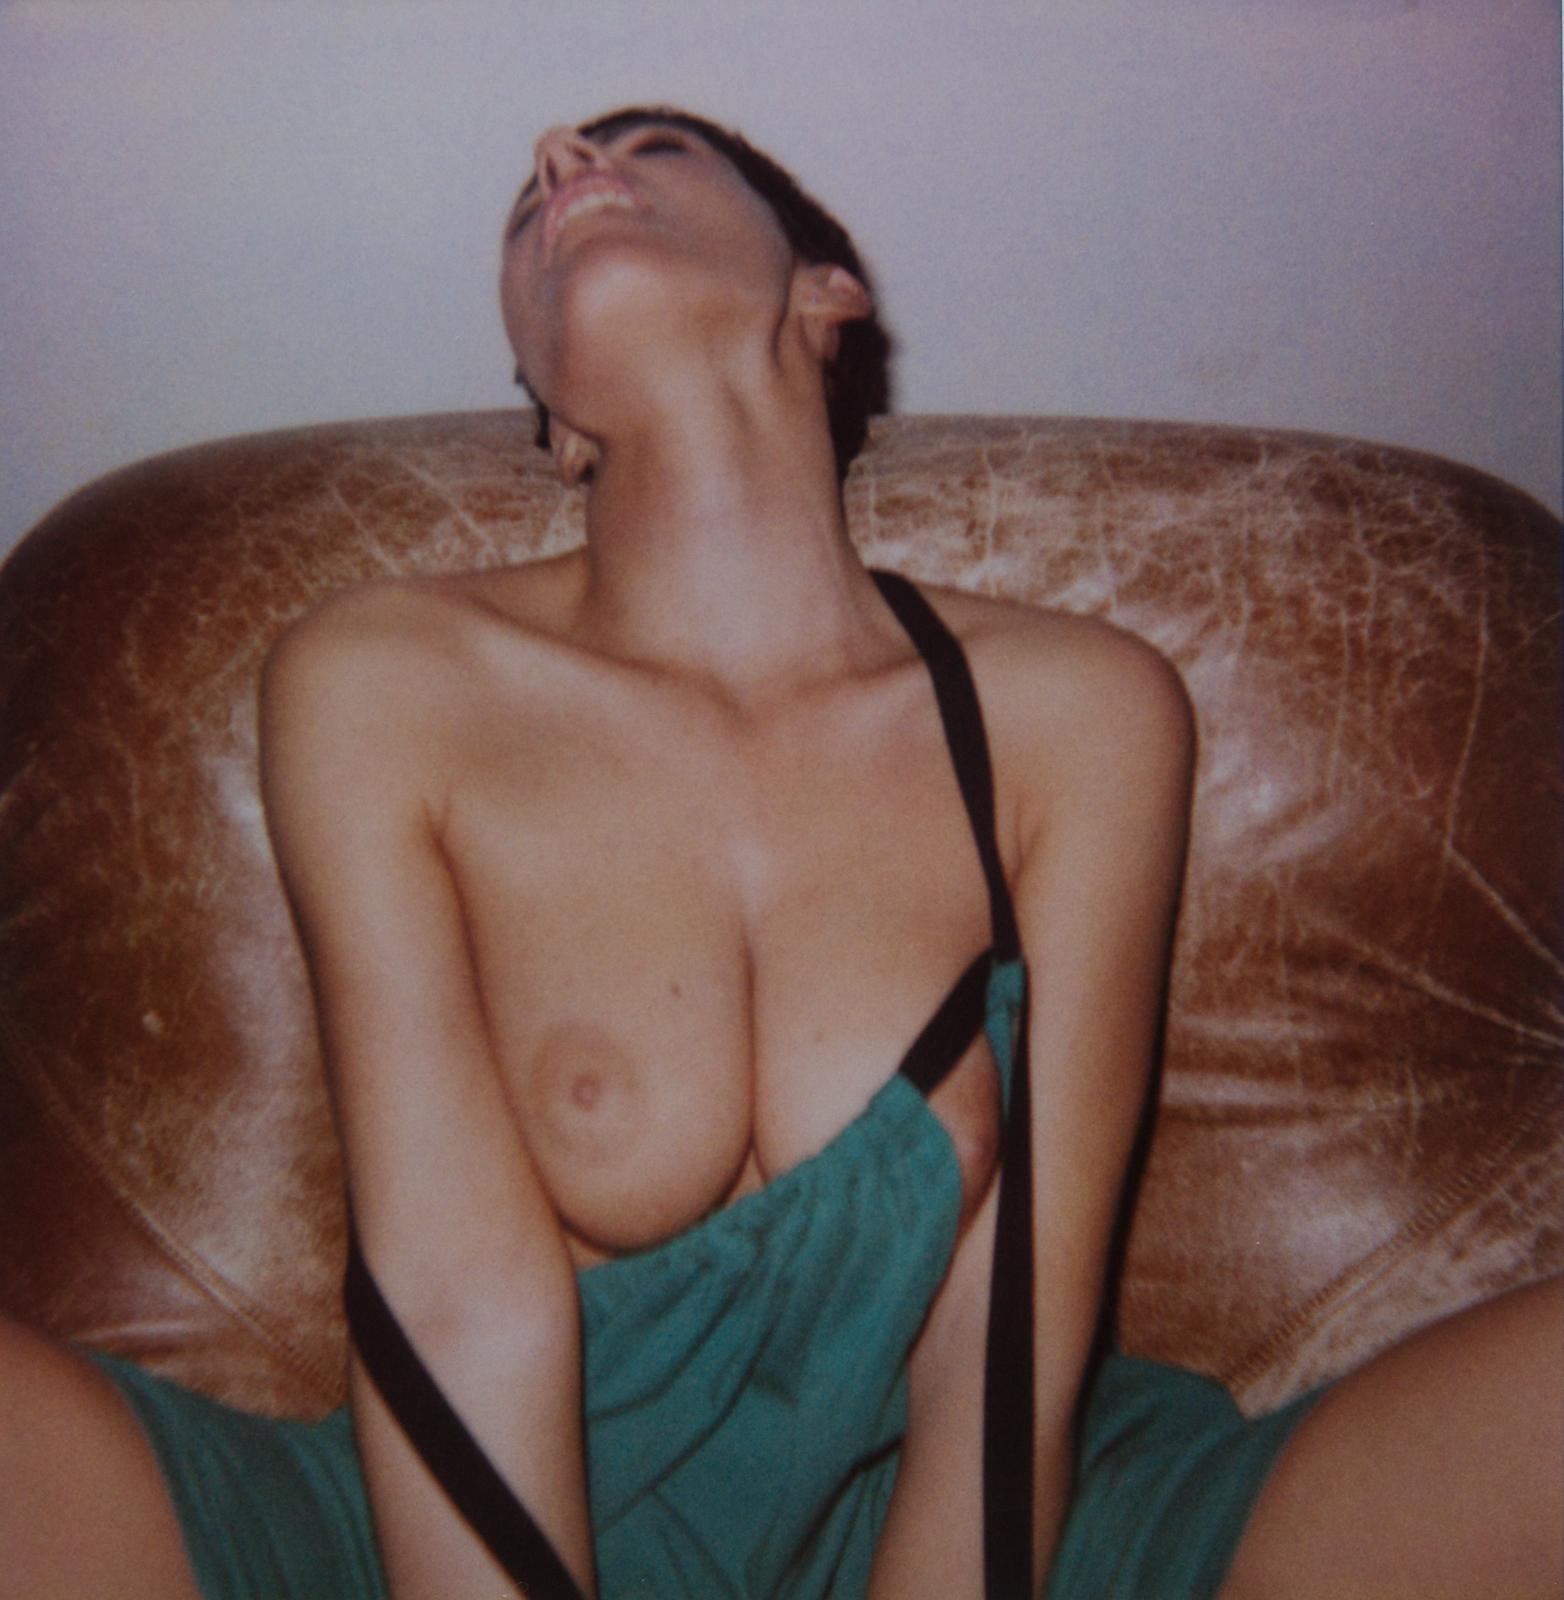 Corrado Dalcò and his erotic photographs